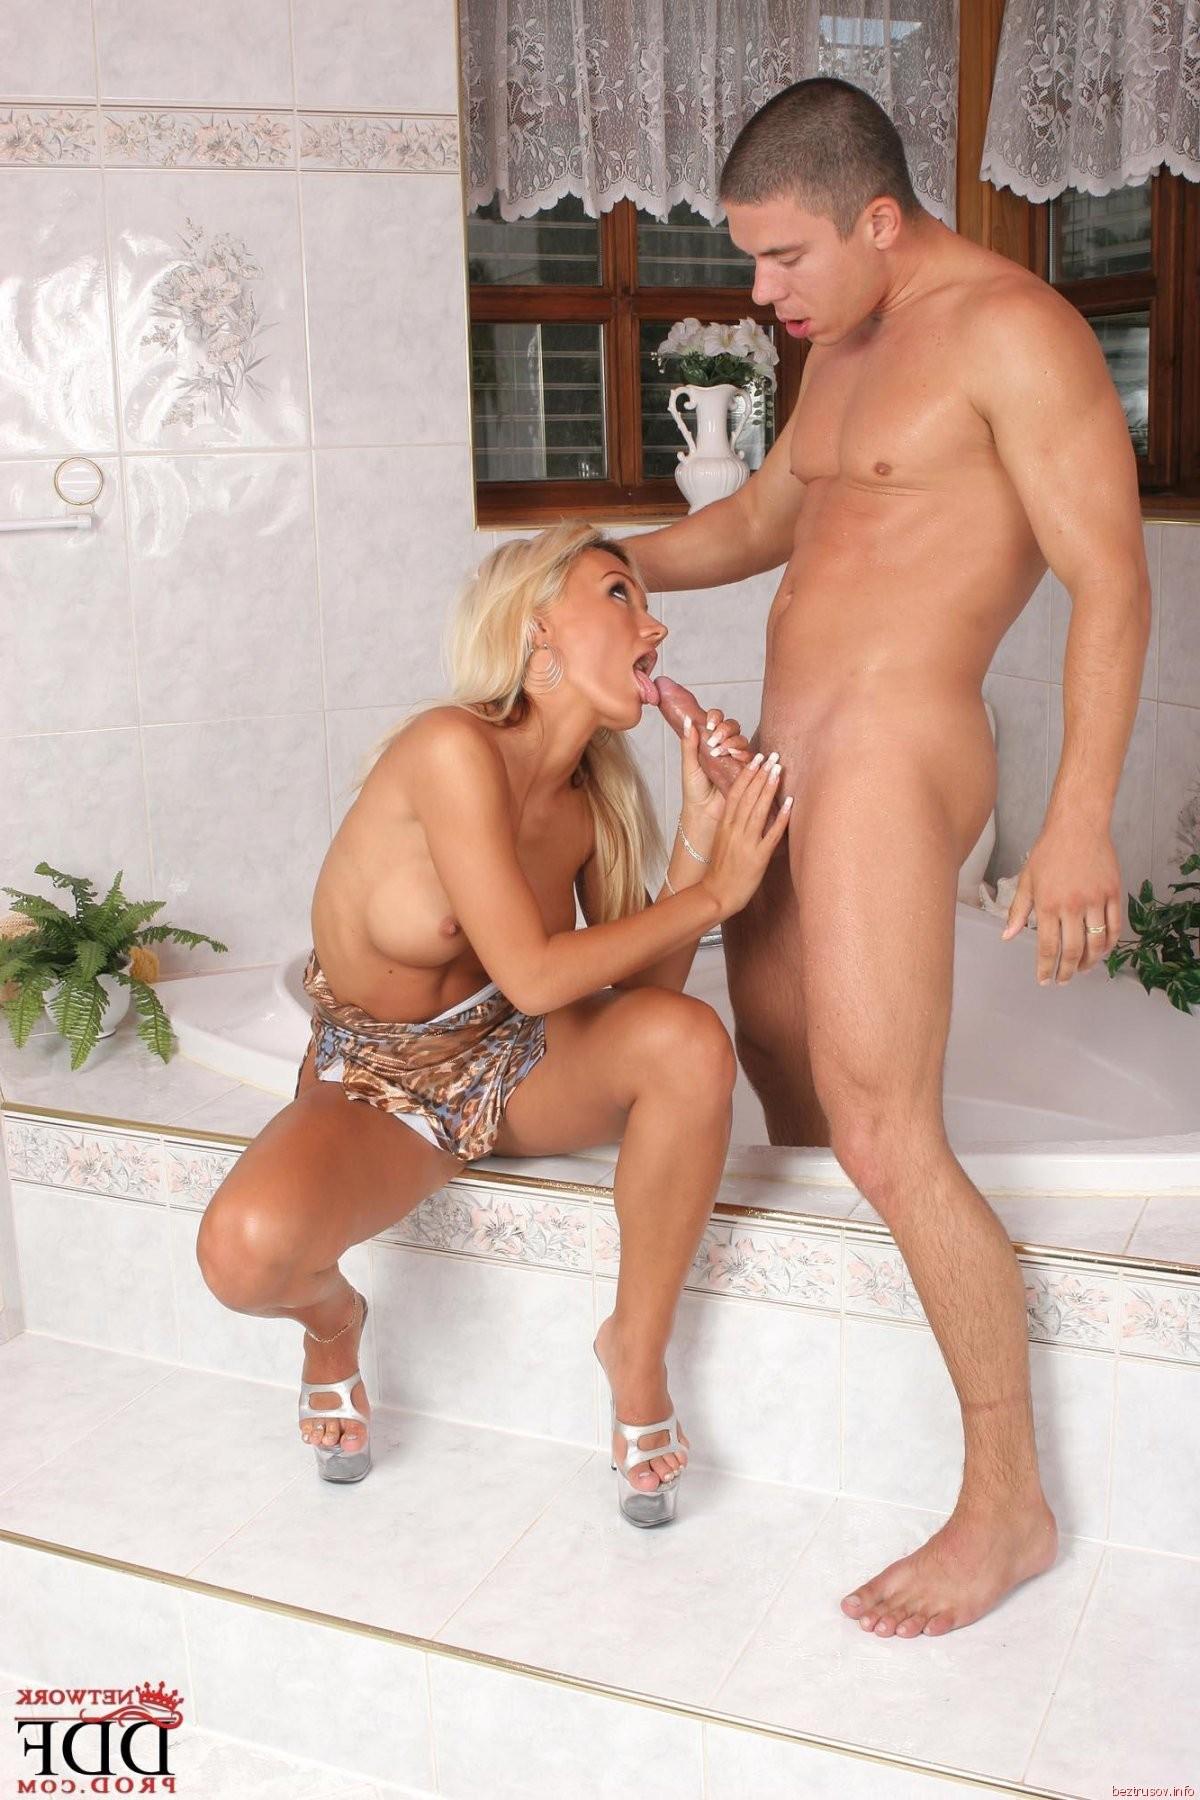 kimberly williams paisley sex scene – BDSM